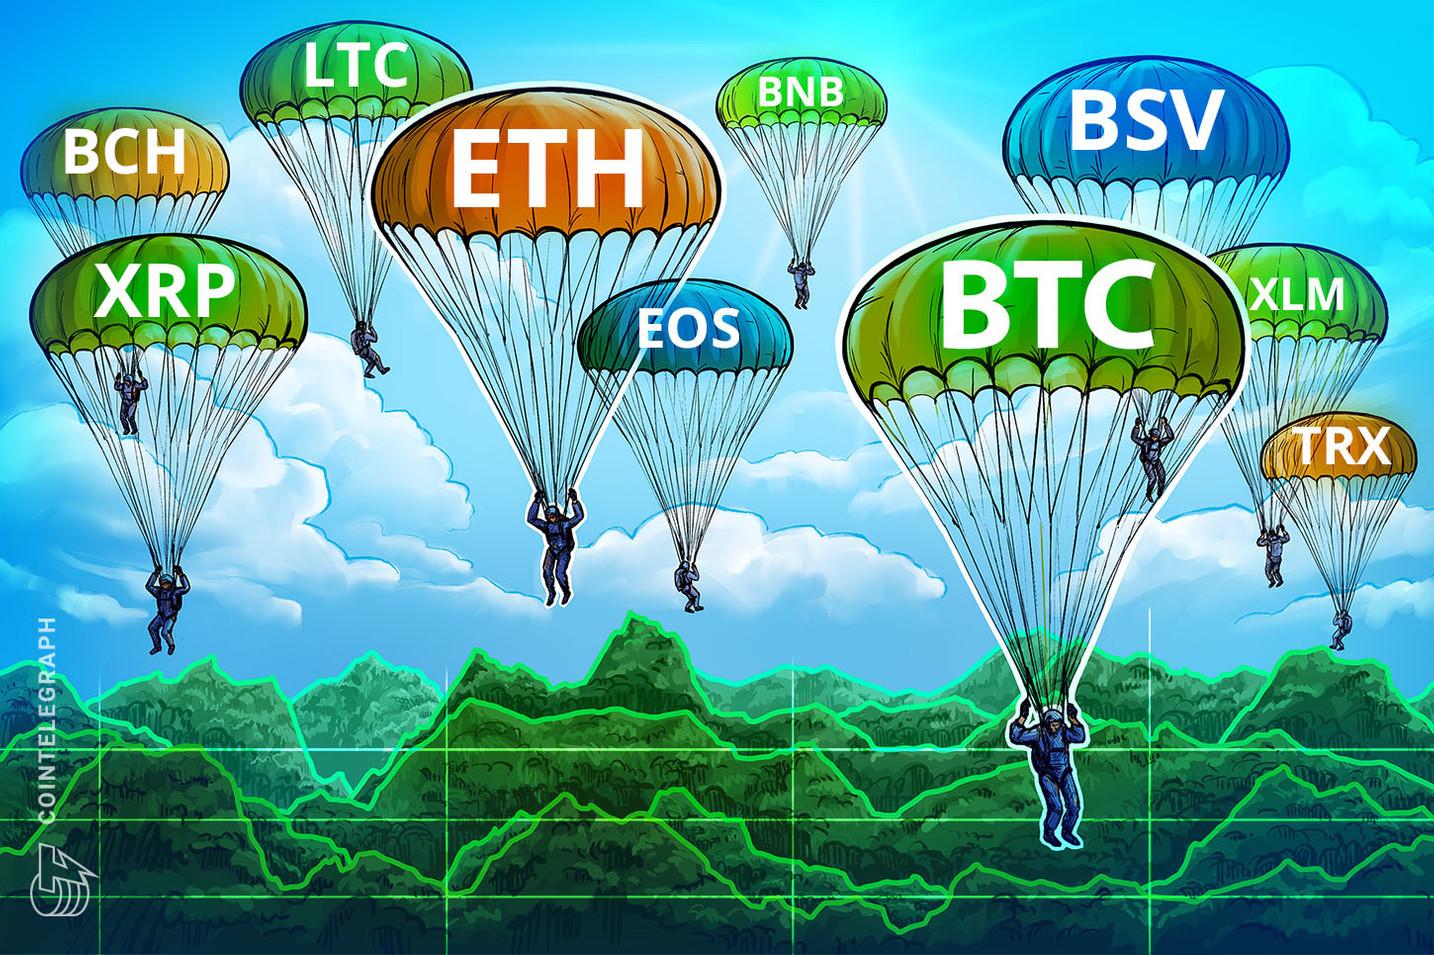 Análise de preços 27/11: BTC, ETH, XRP, BCH, LTC, EOS, BNB, BSV, XLM, TRX